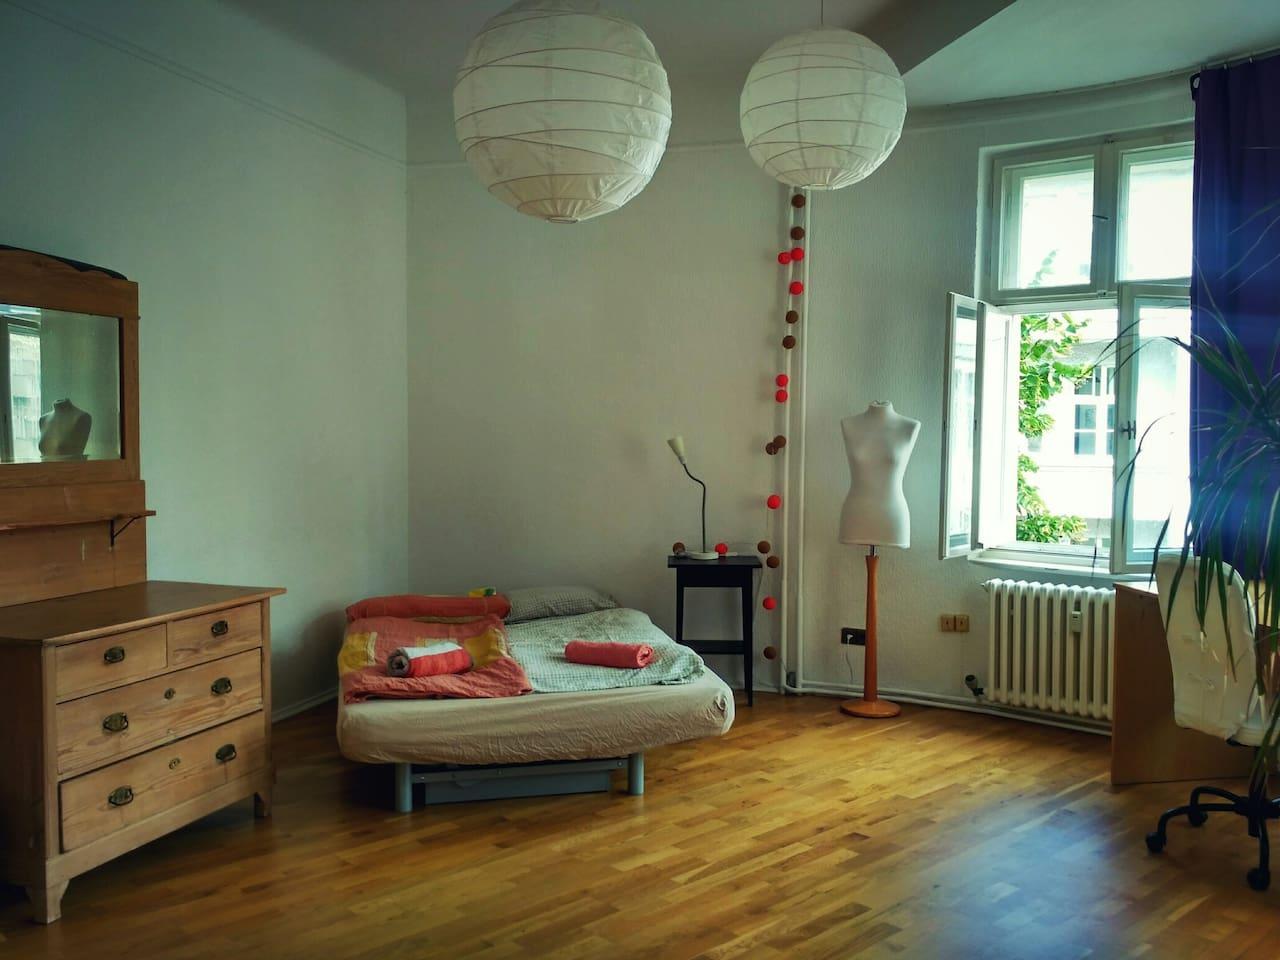 Schlafzimmer/dormitory